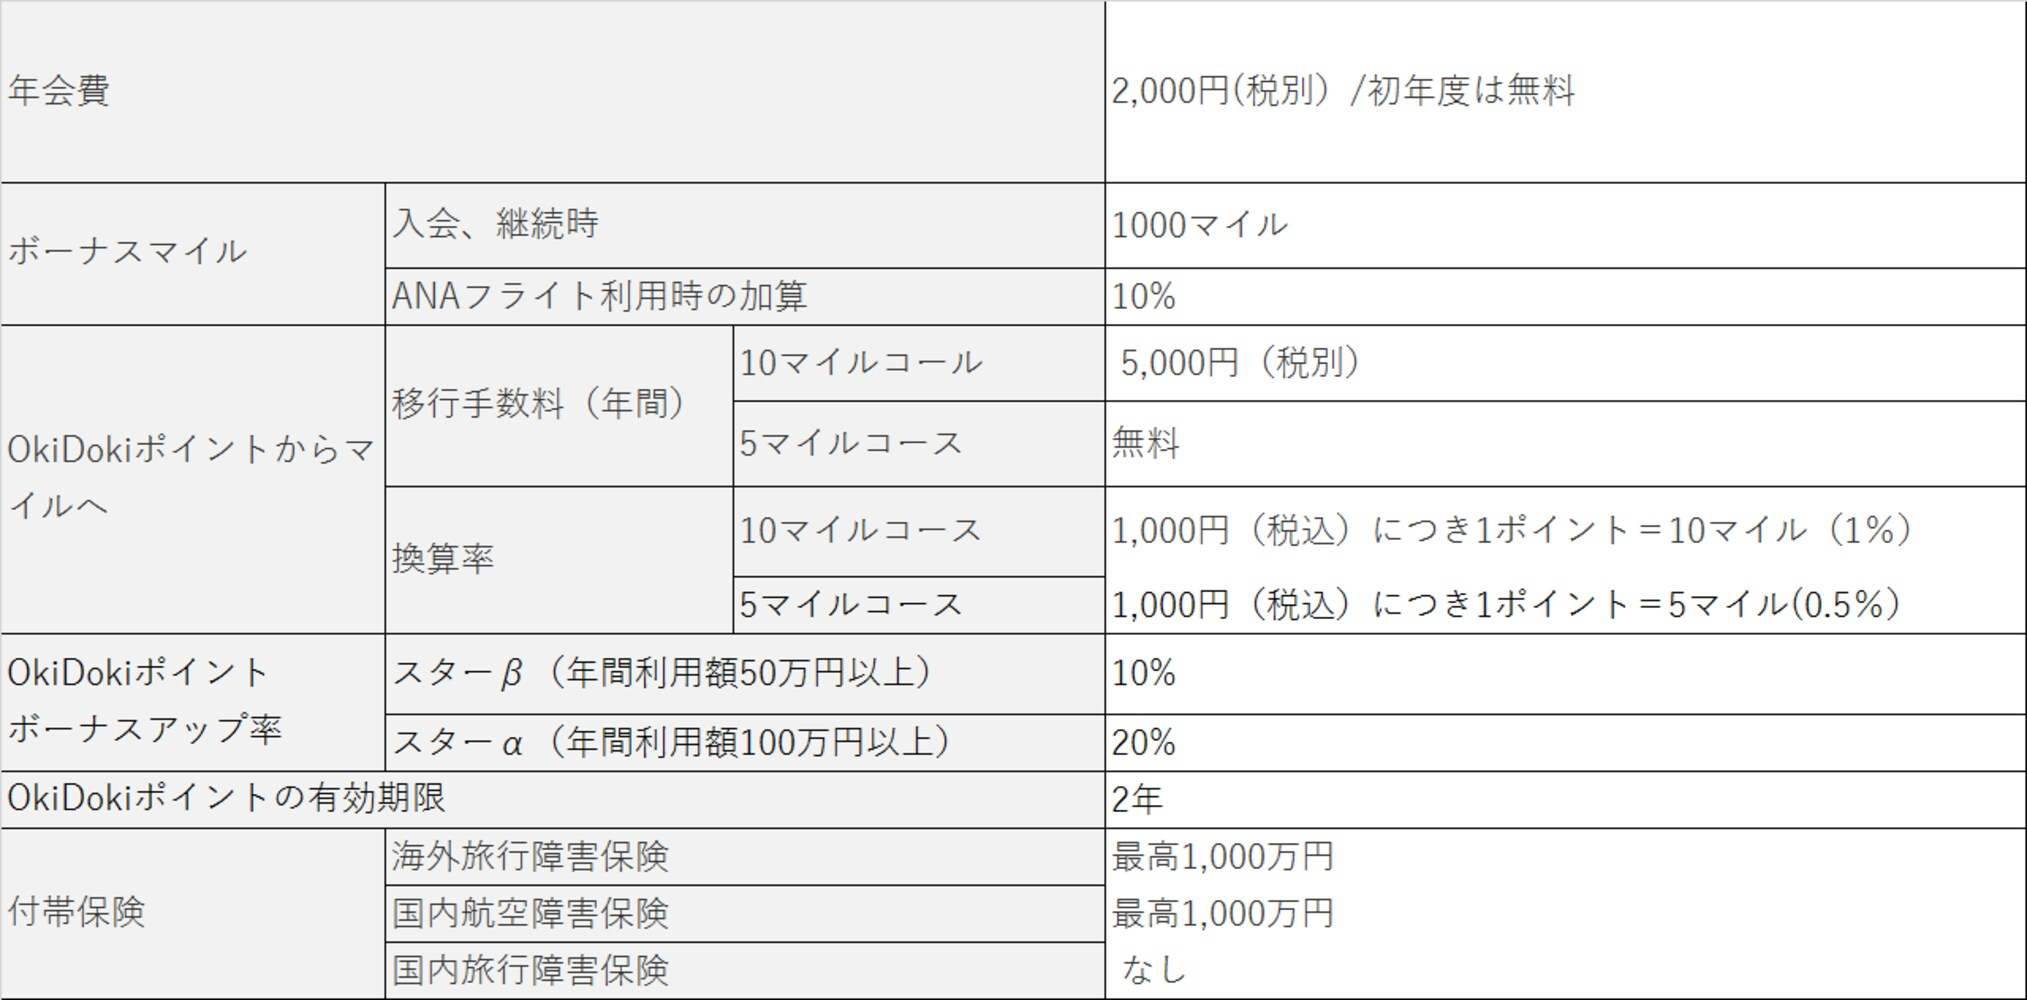 ANAJCB一般カードの基本情報